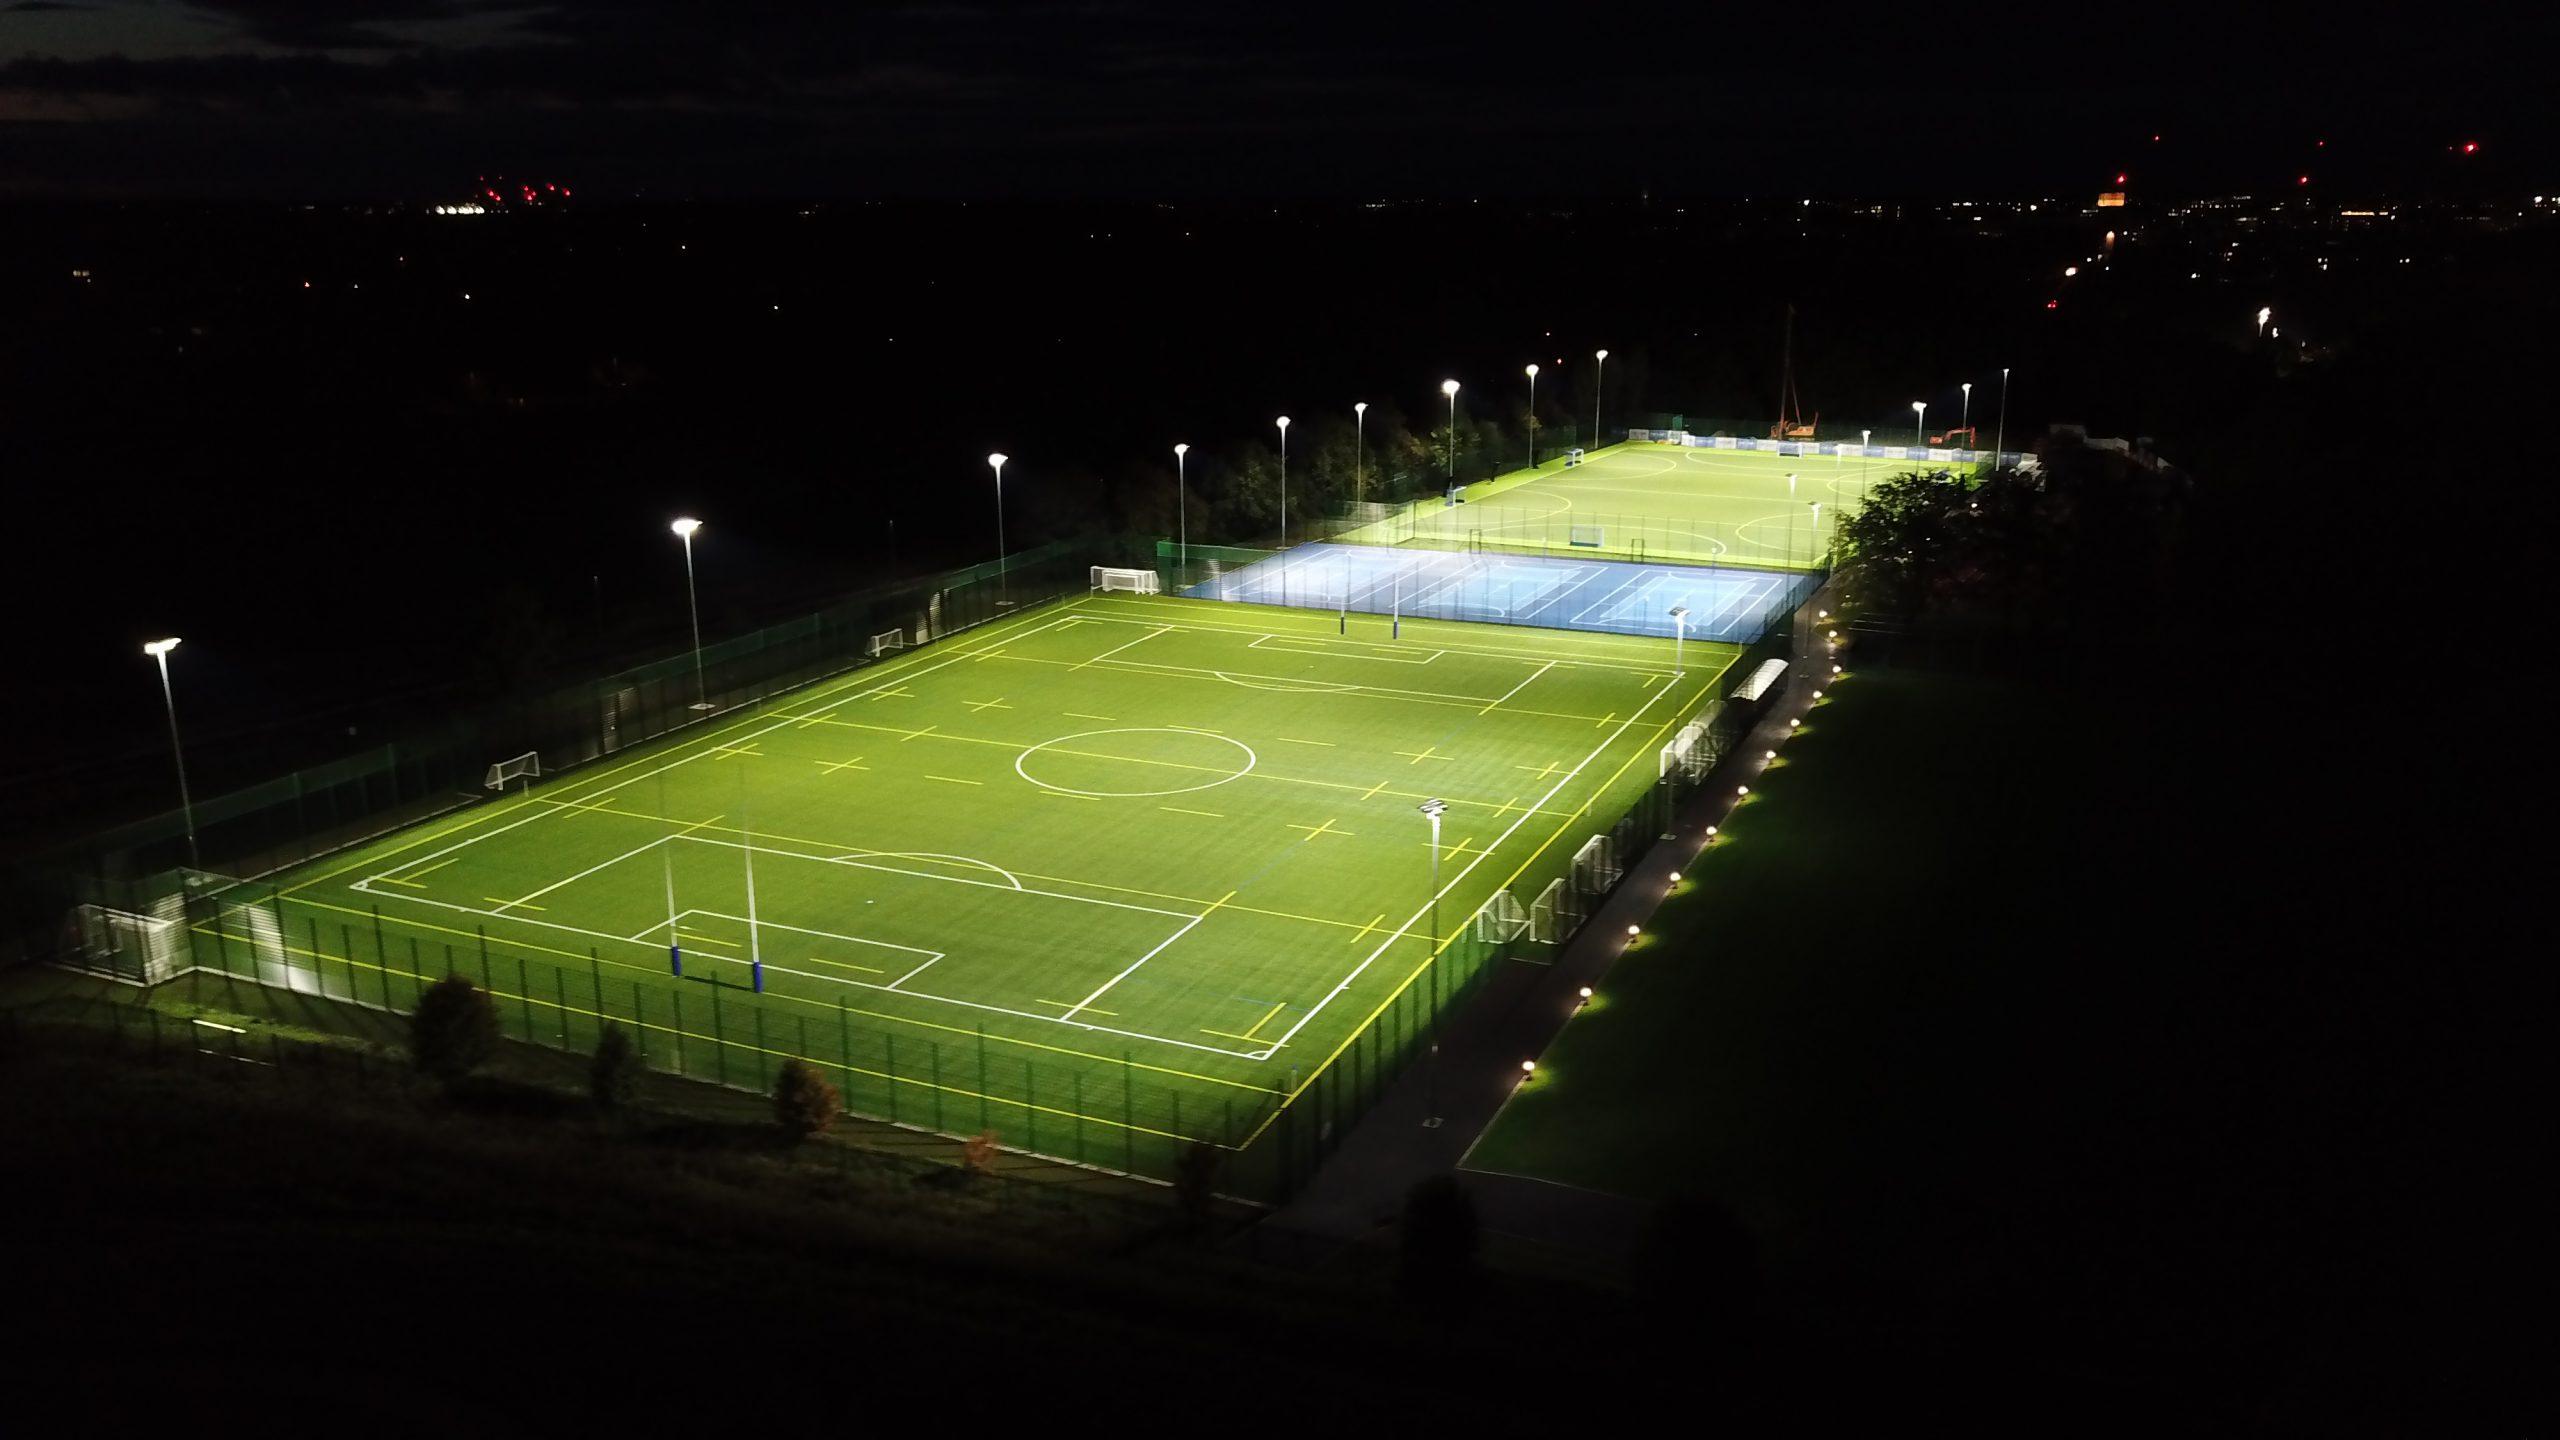 st marys school cambridge homerton college sis pitches halliday lighting